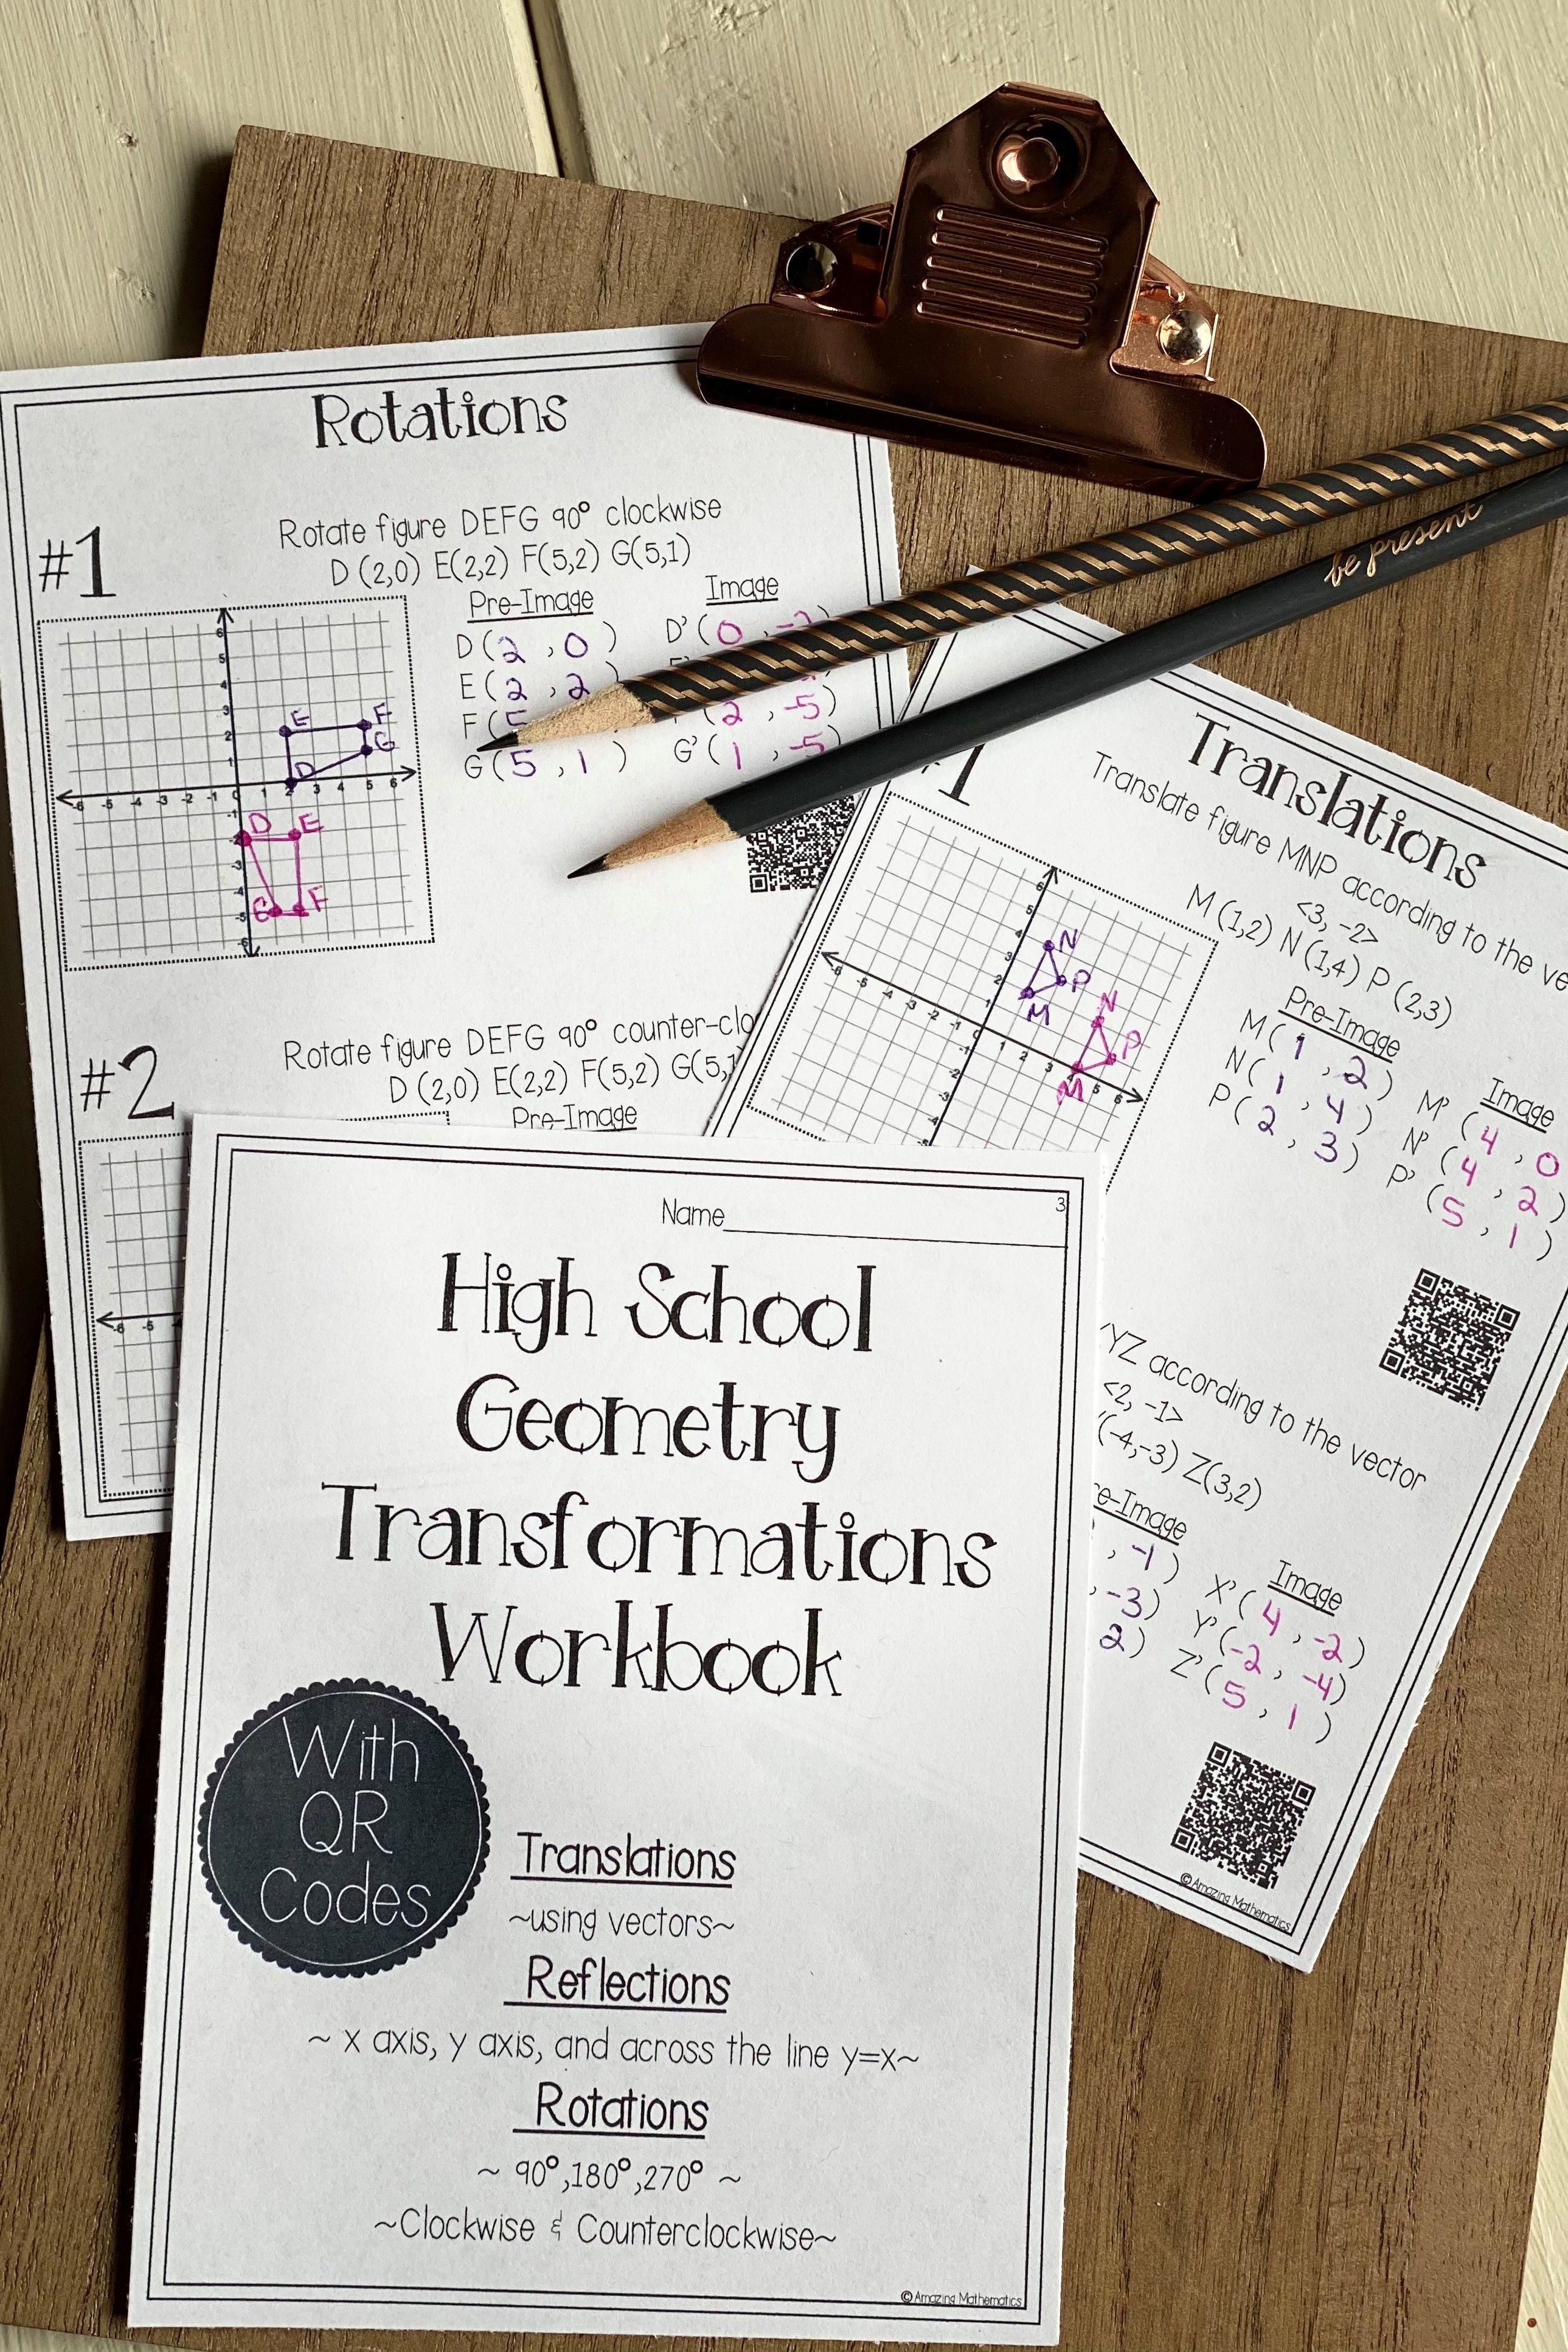 Hs Geometry Transformations Workbook Translations Rotations Reflections Hs Geometry Geometry Worksheets Workbook [ 3867 x 2578 Pixel ]